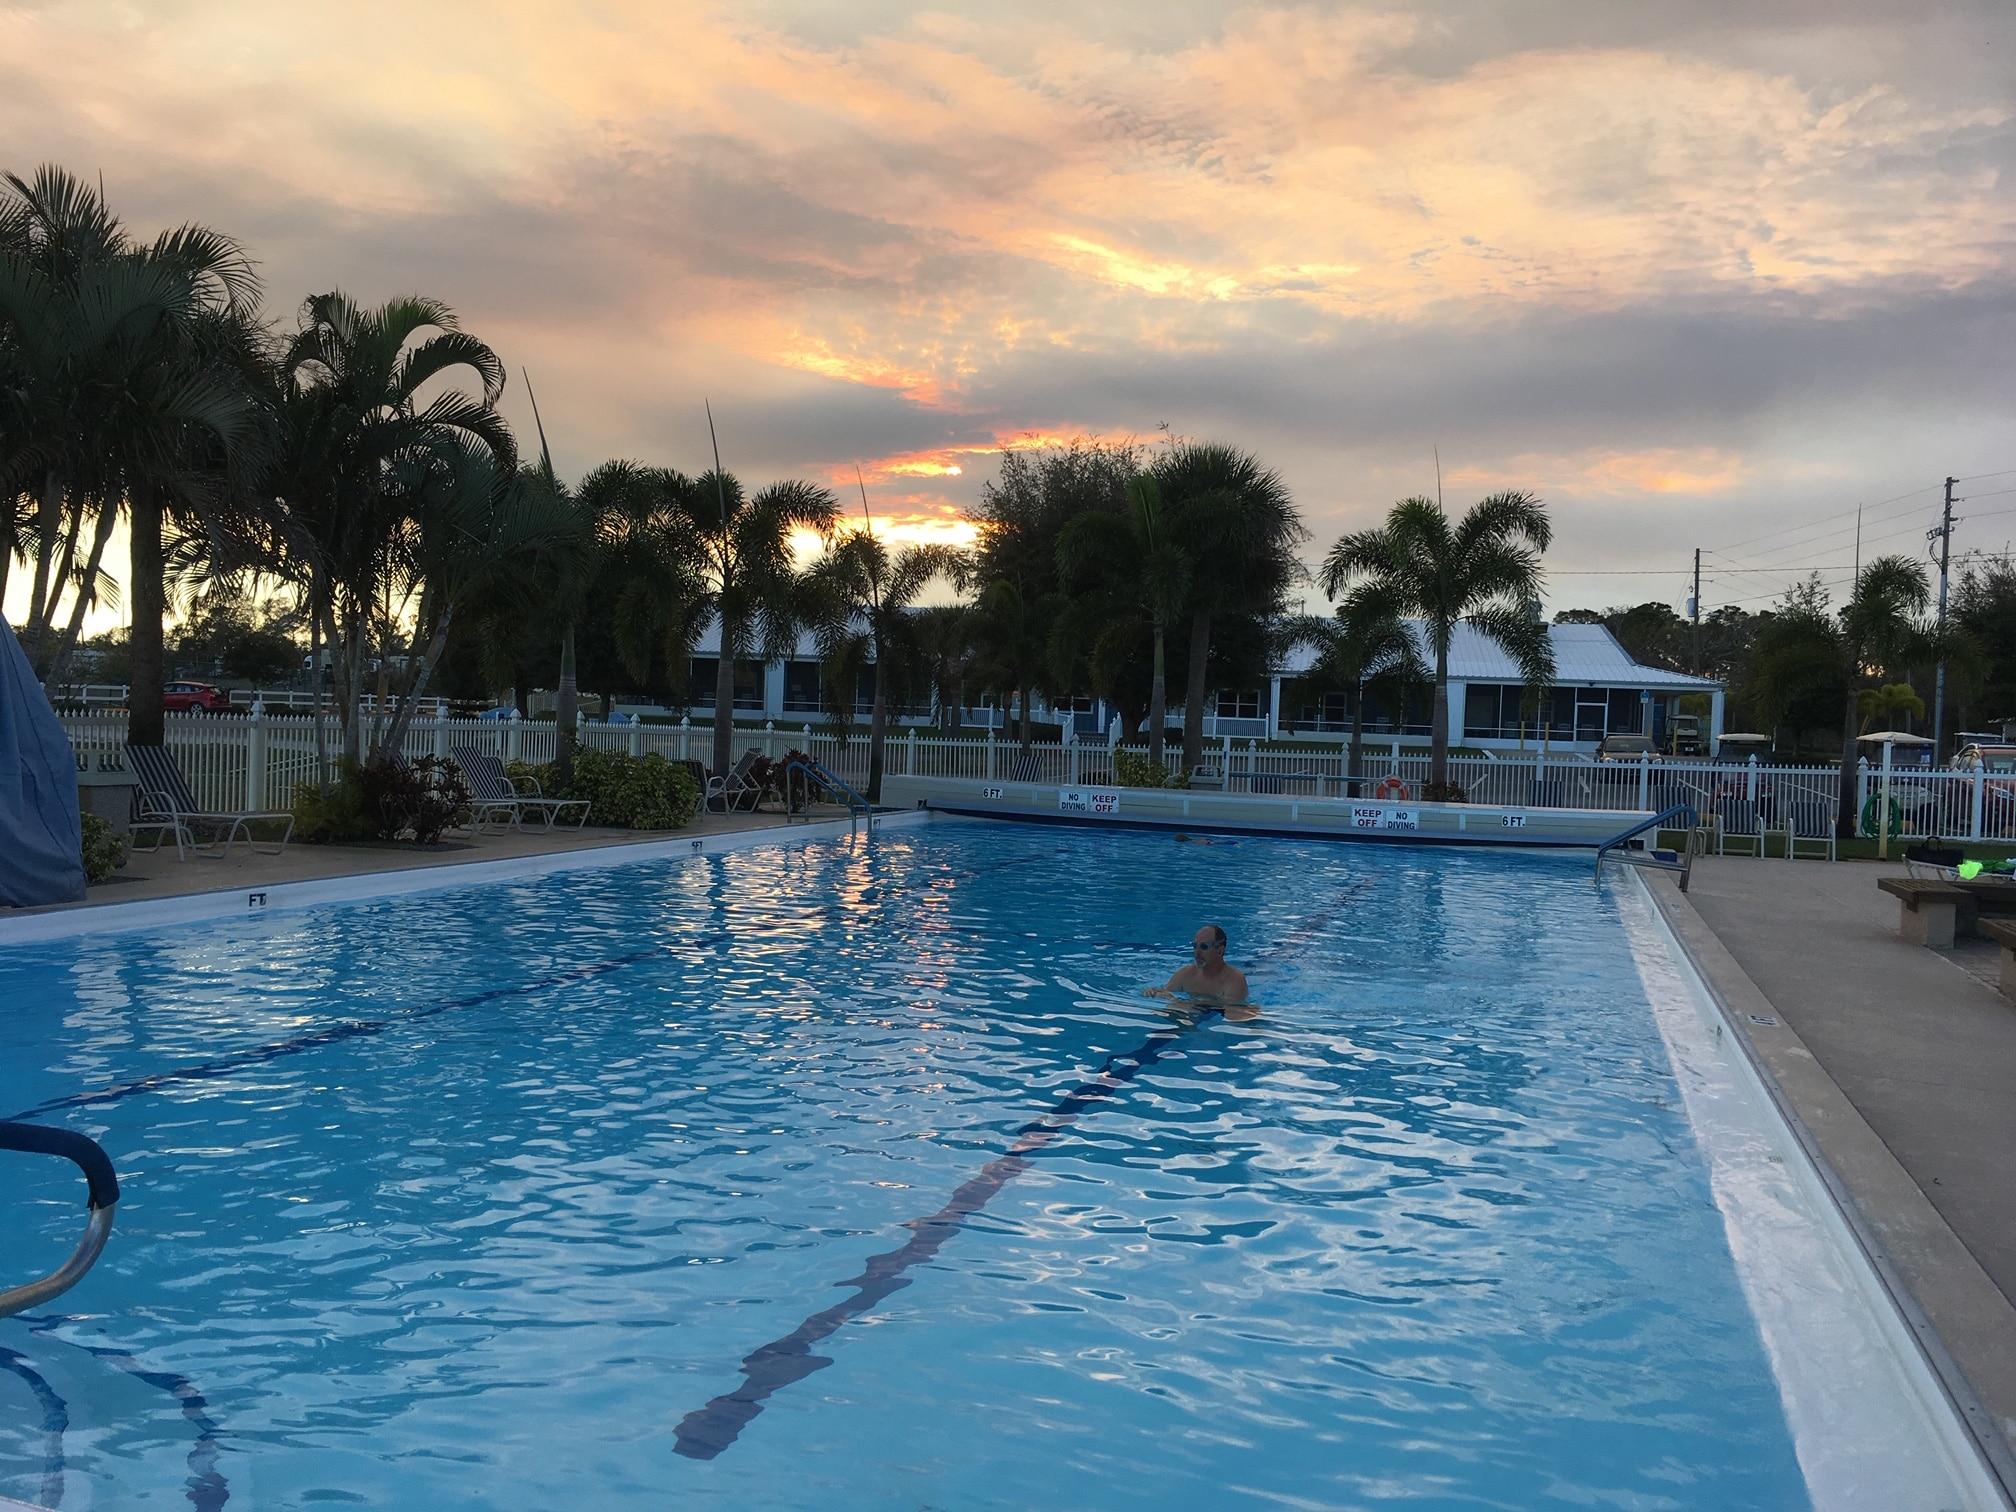 Camp Florida RV Resort at Sunset in Sebring, FL